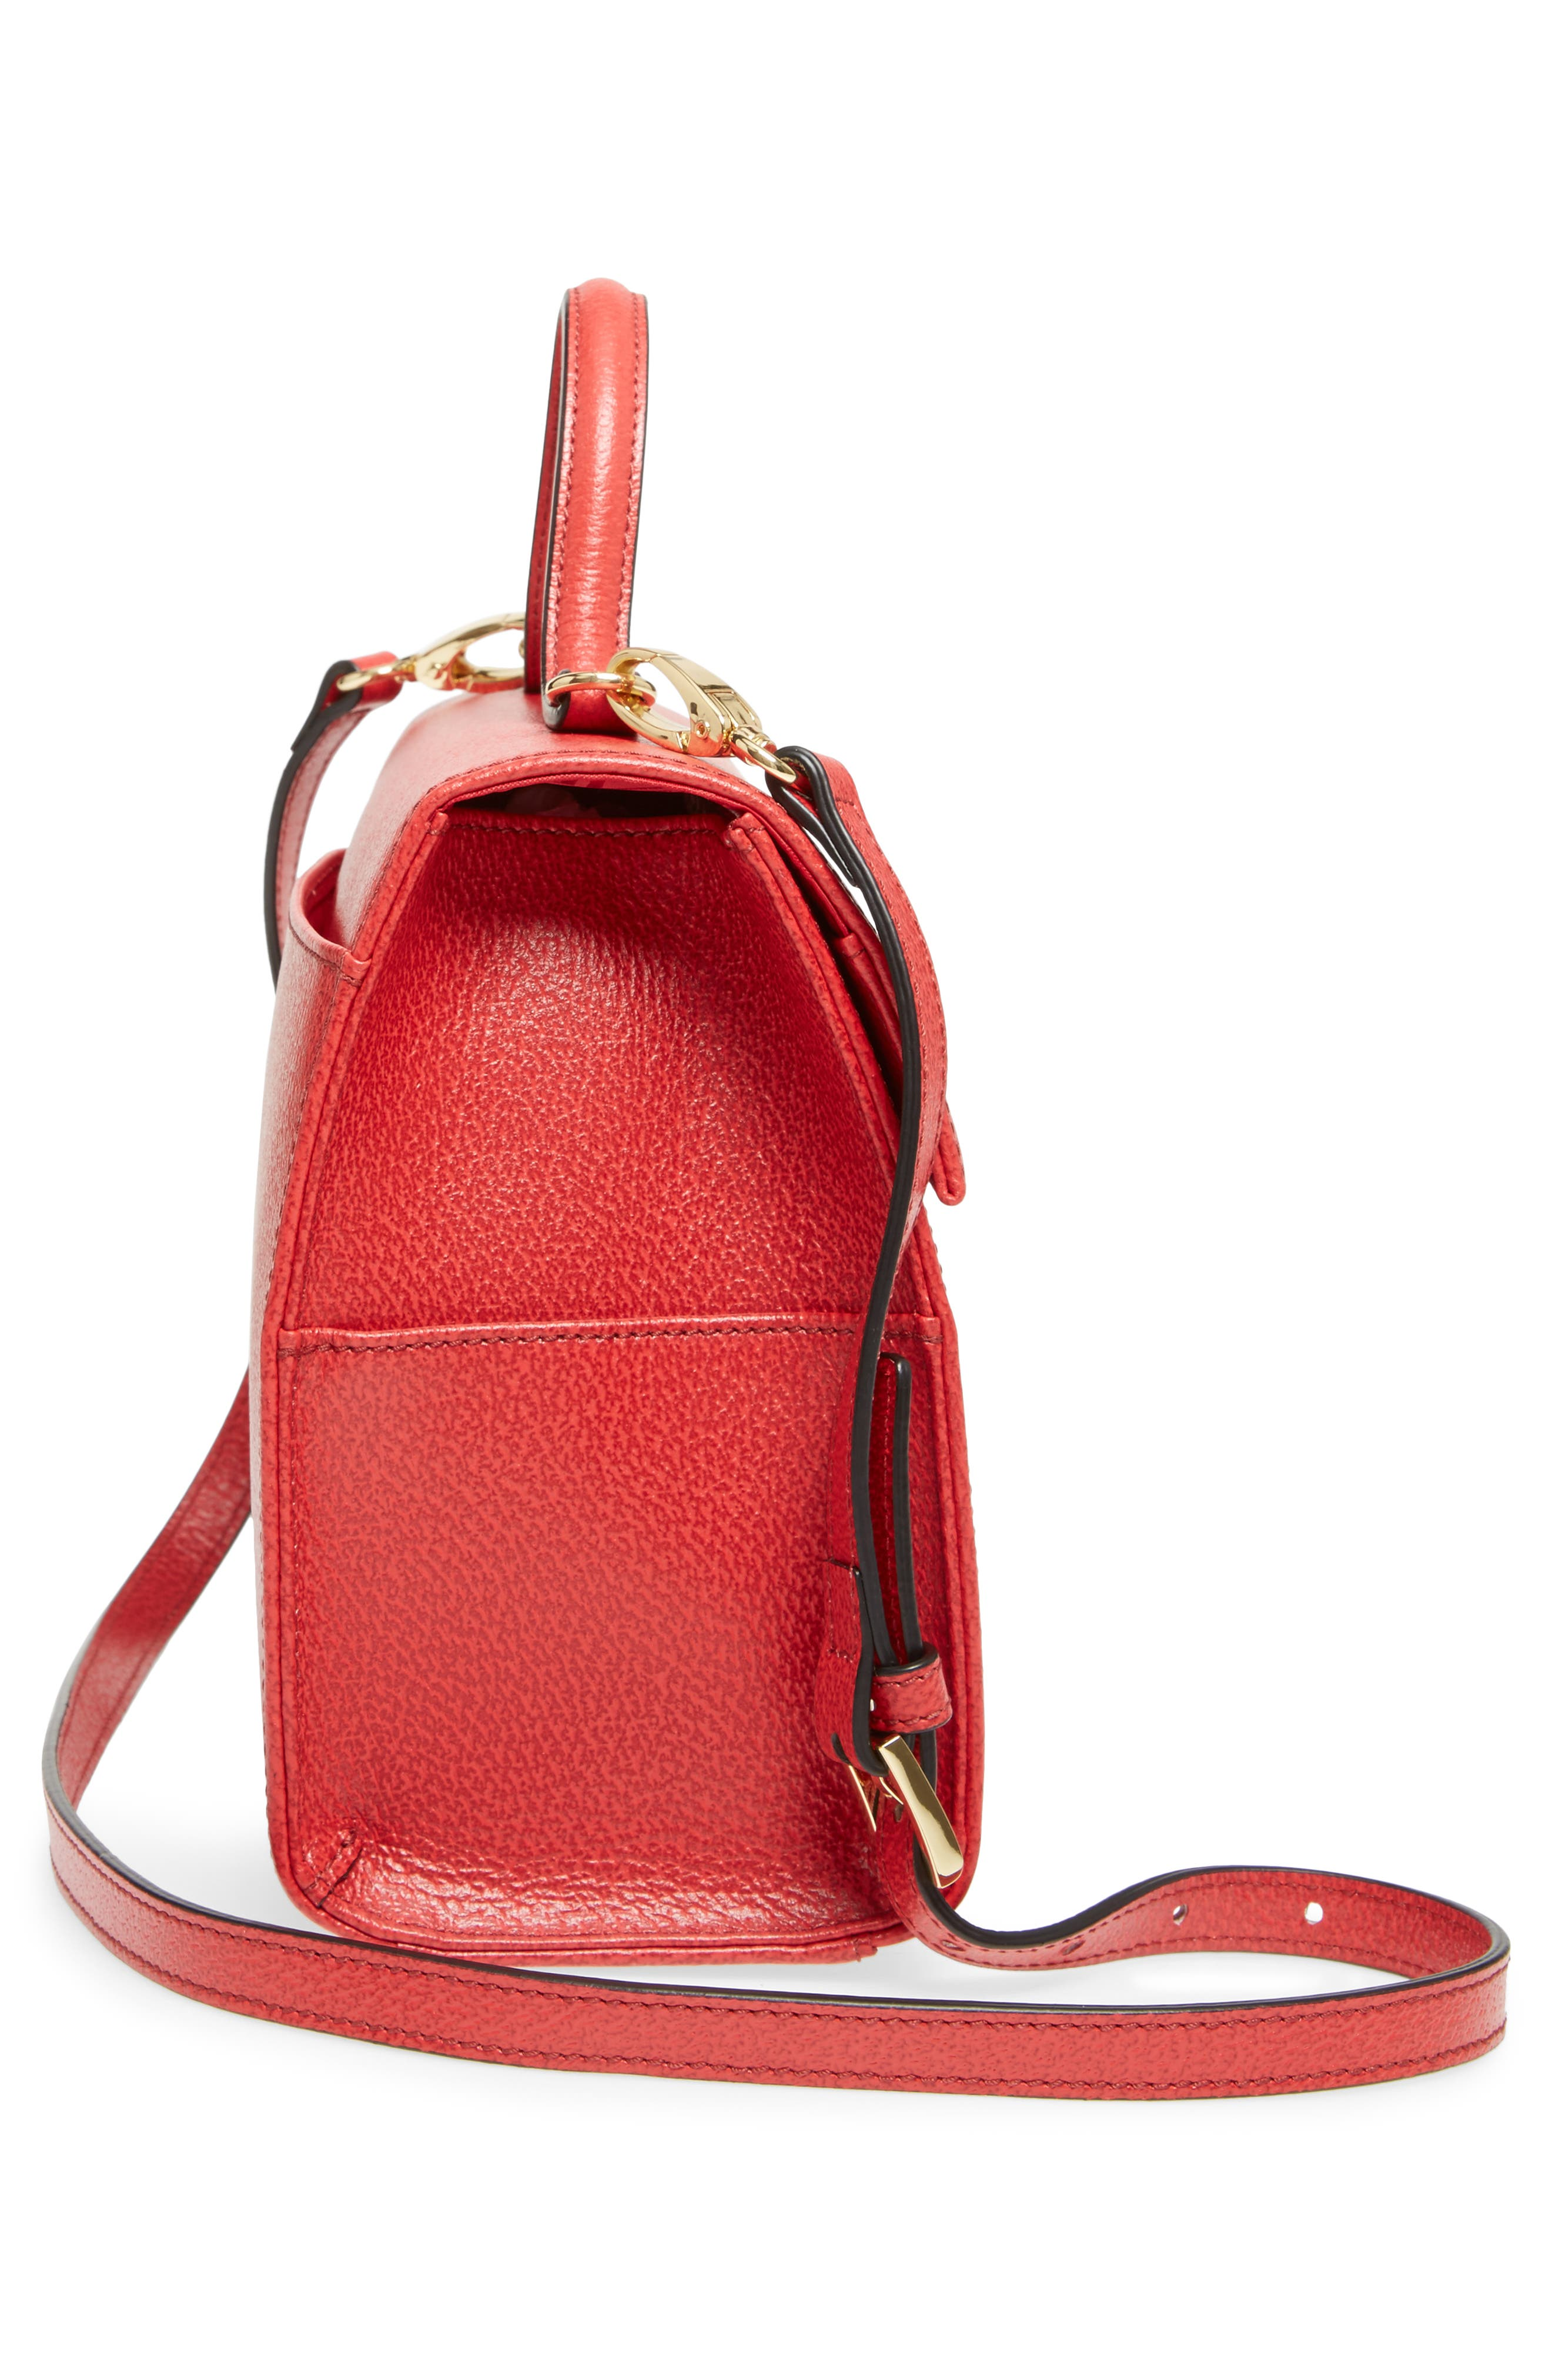 LODIS Stephanie Under Lock & Key - Medium Bree Leather Crossbody Bag,                             Alternate thumbnail 4, color,                             Red